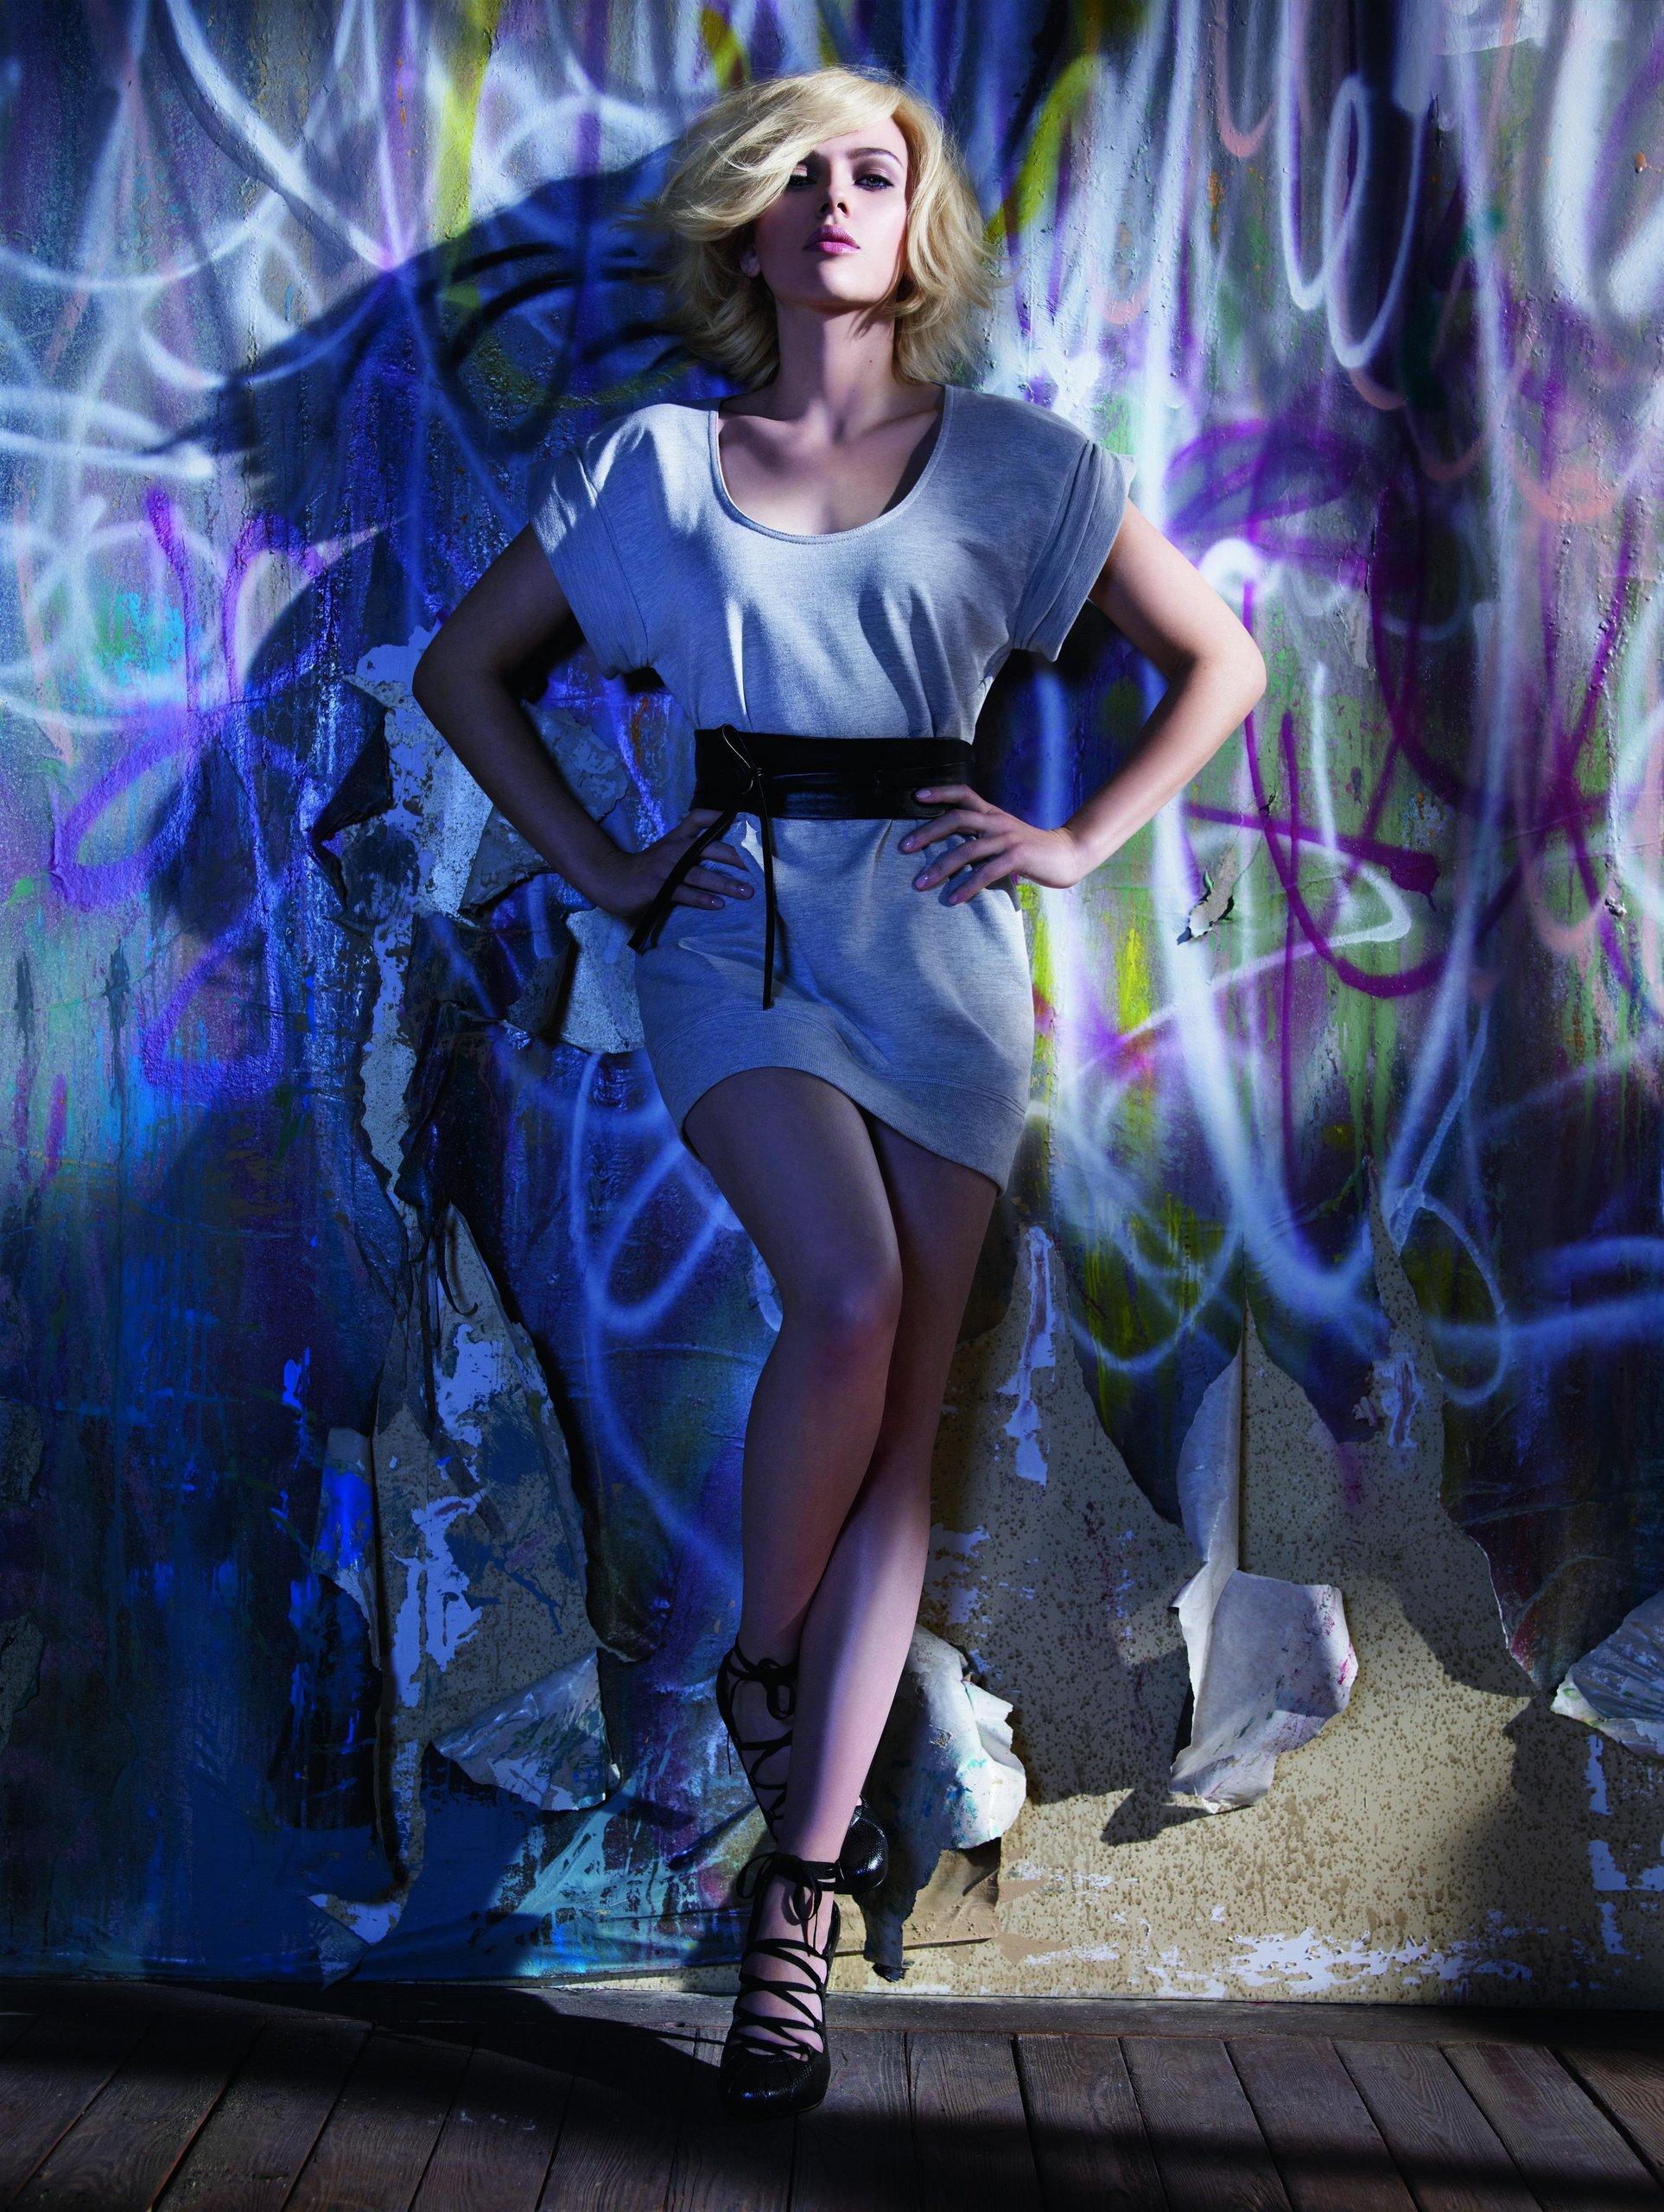 Scarlett Johansson | Mango Photoshoot (UHQ) - scarlett-johansson photo